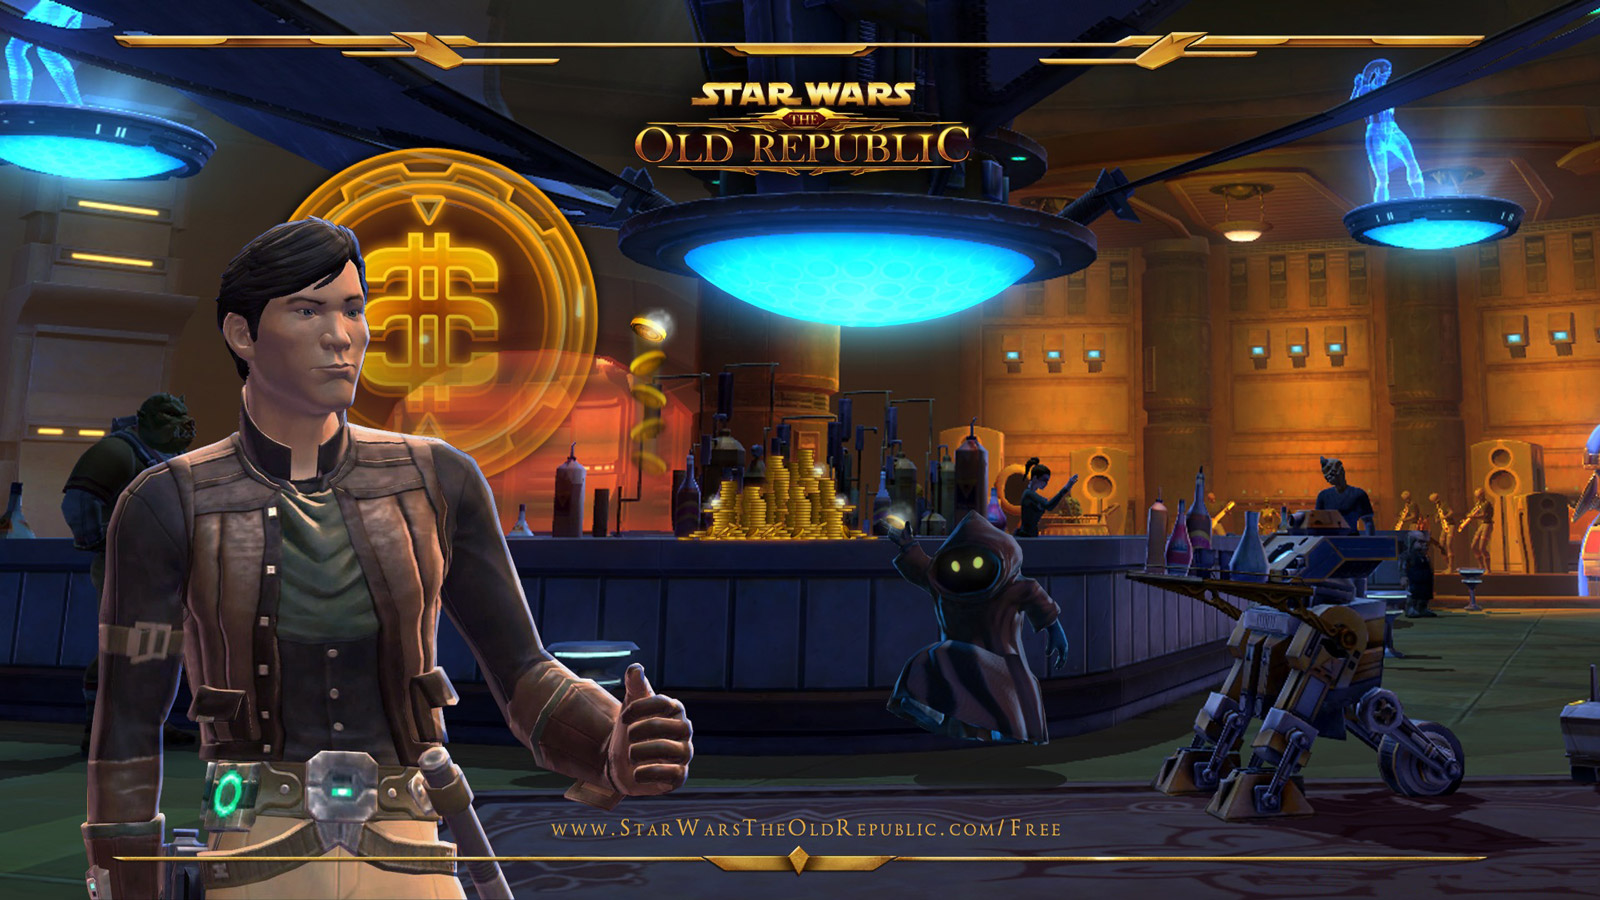 Free Star Wars: The Old Republic Wallpaper in 1600x900